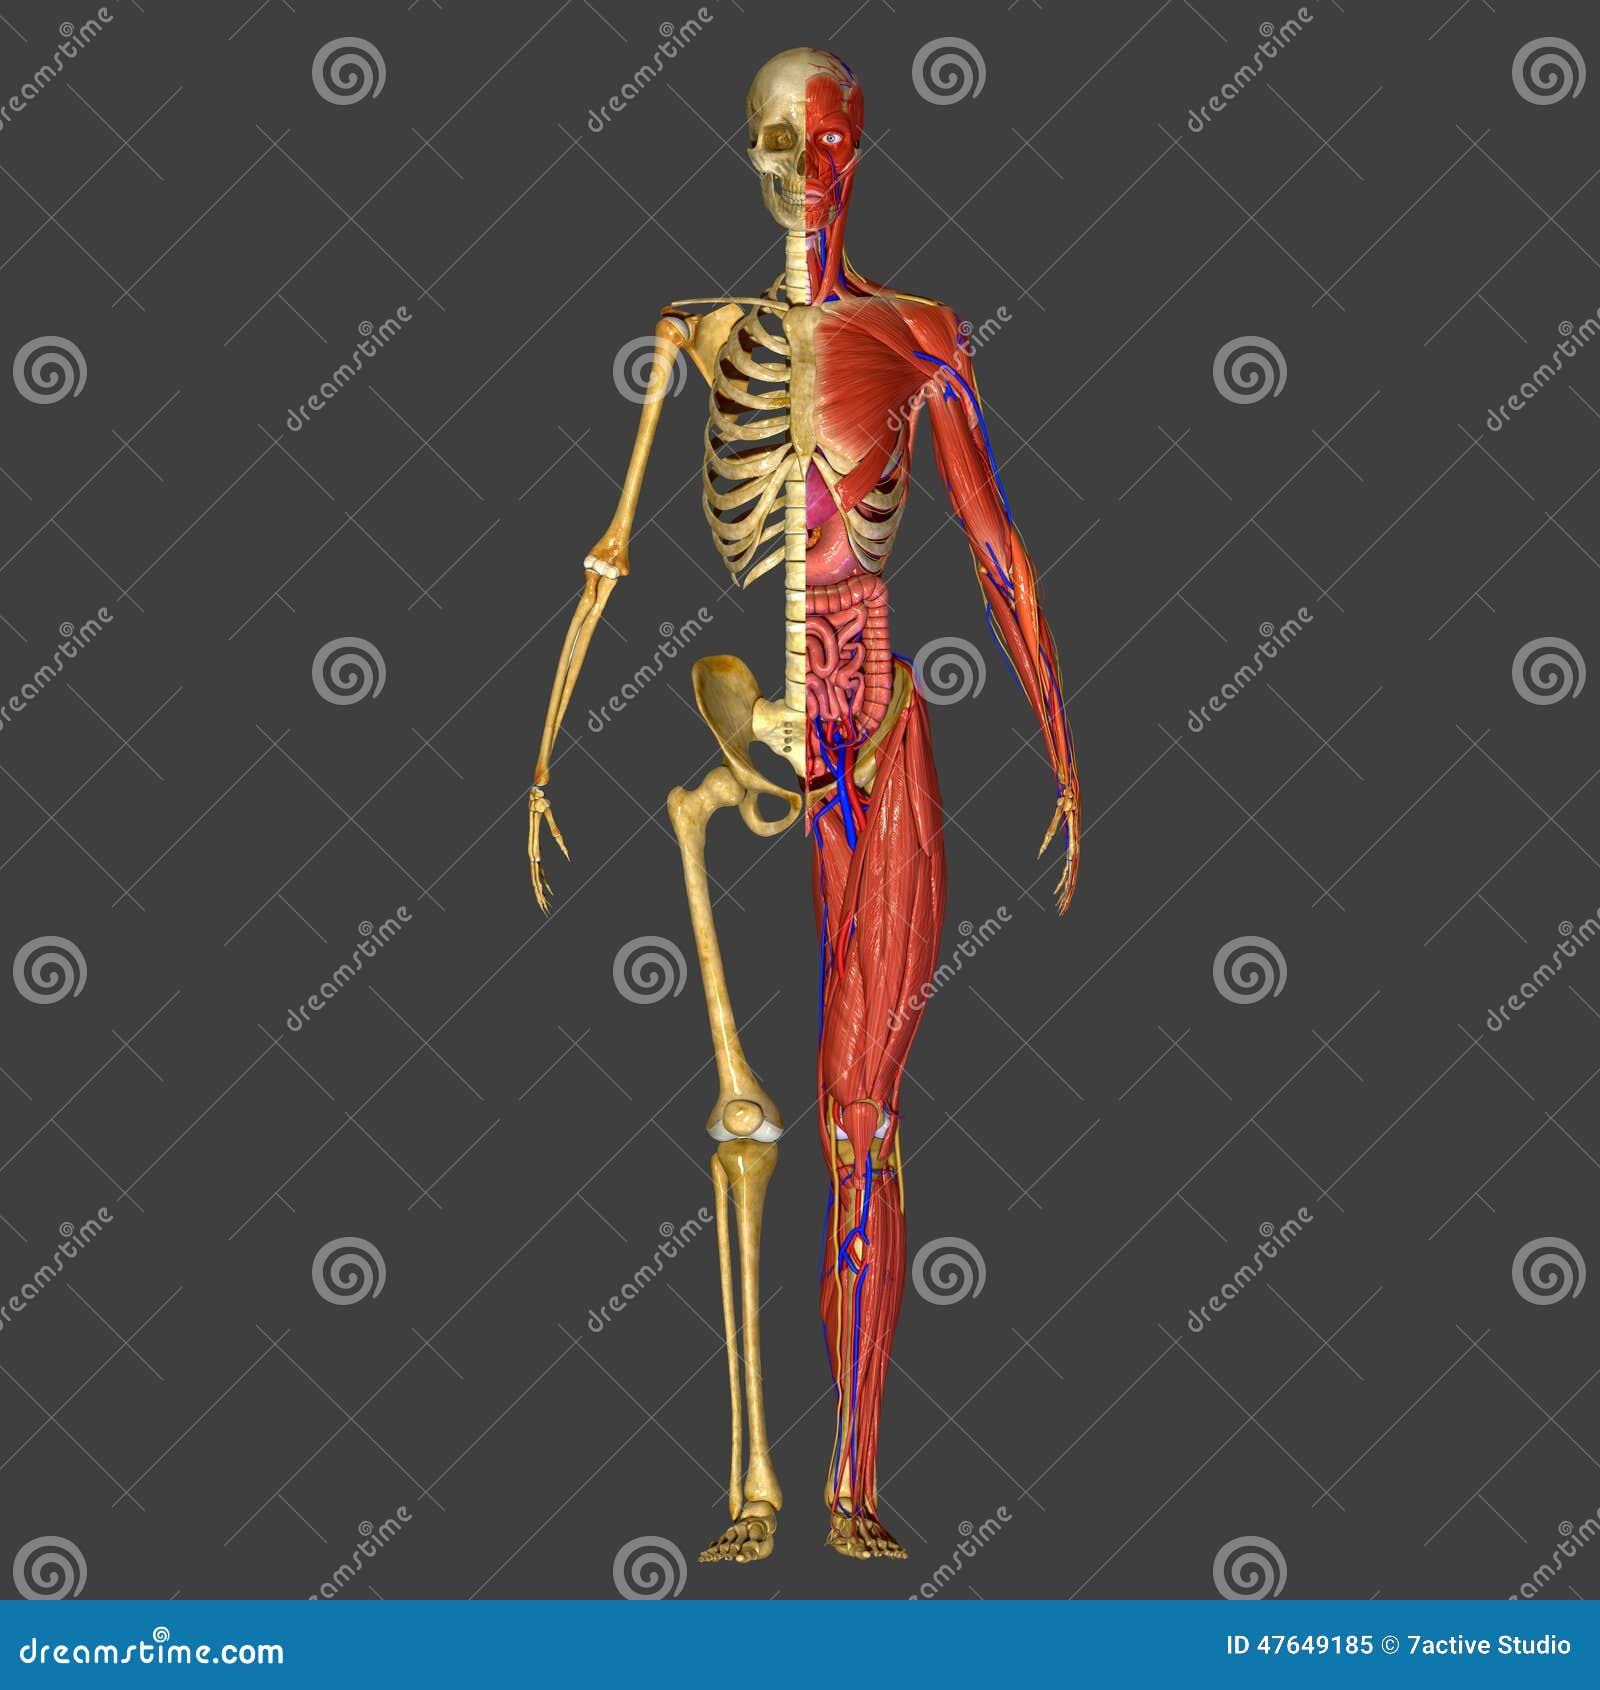 Human Anatomy Stock Image Image Of Digestive Gallbladder 47649185